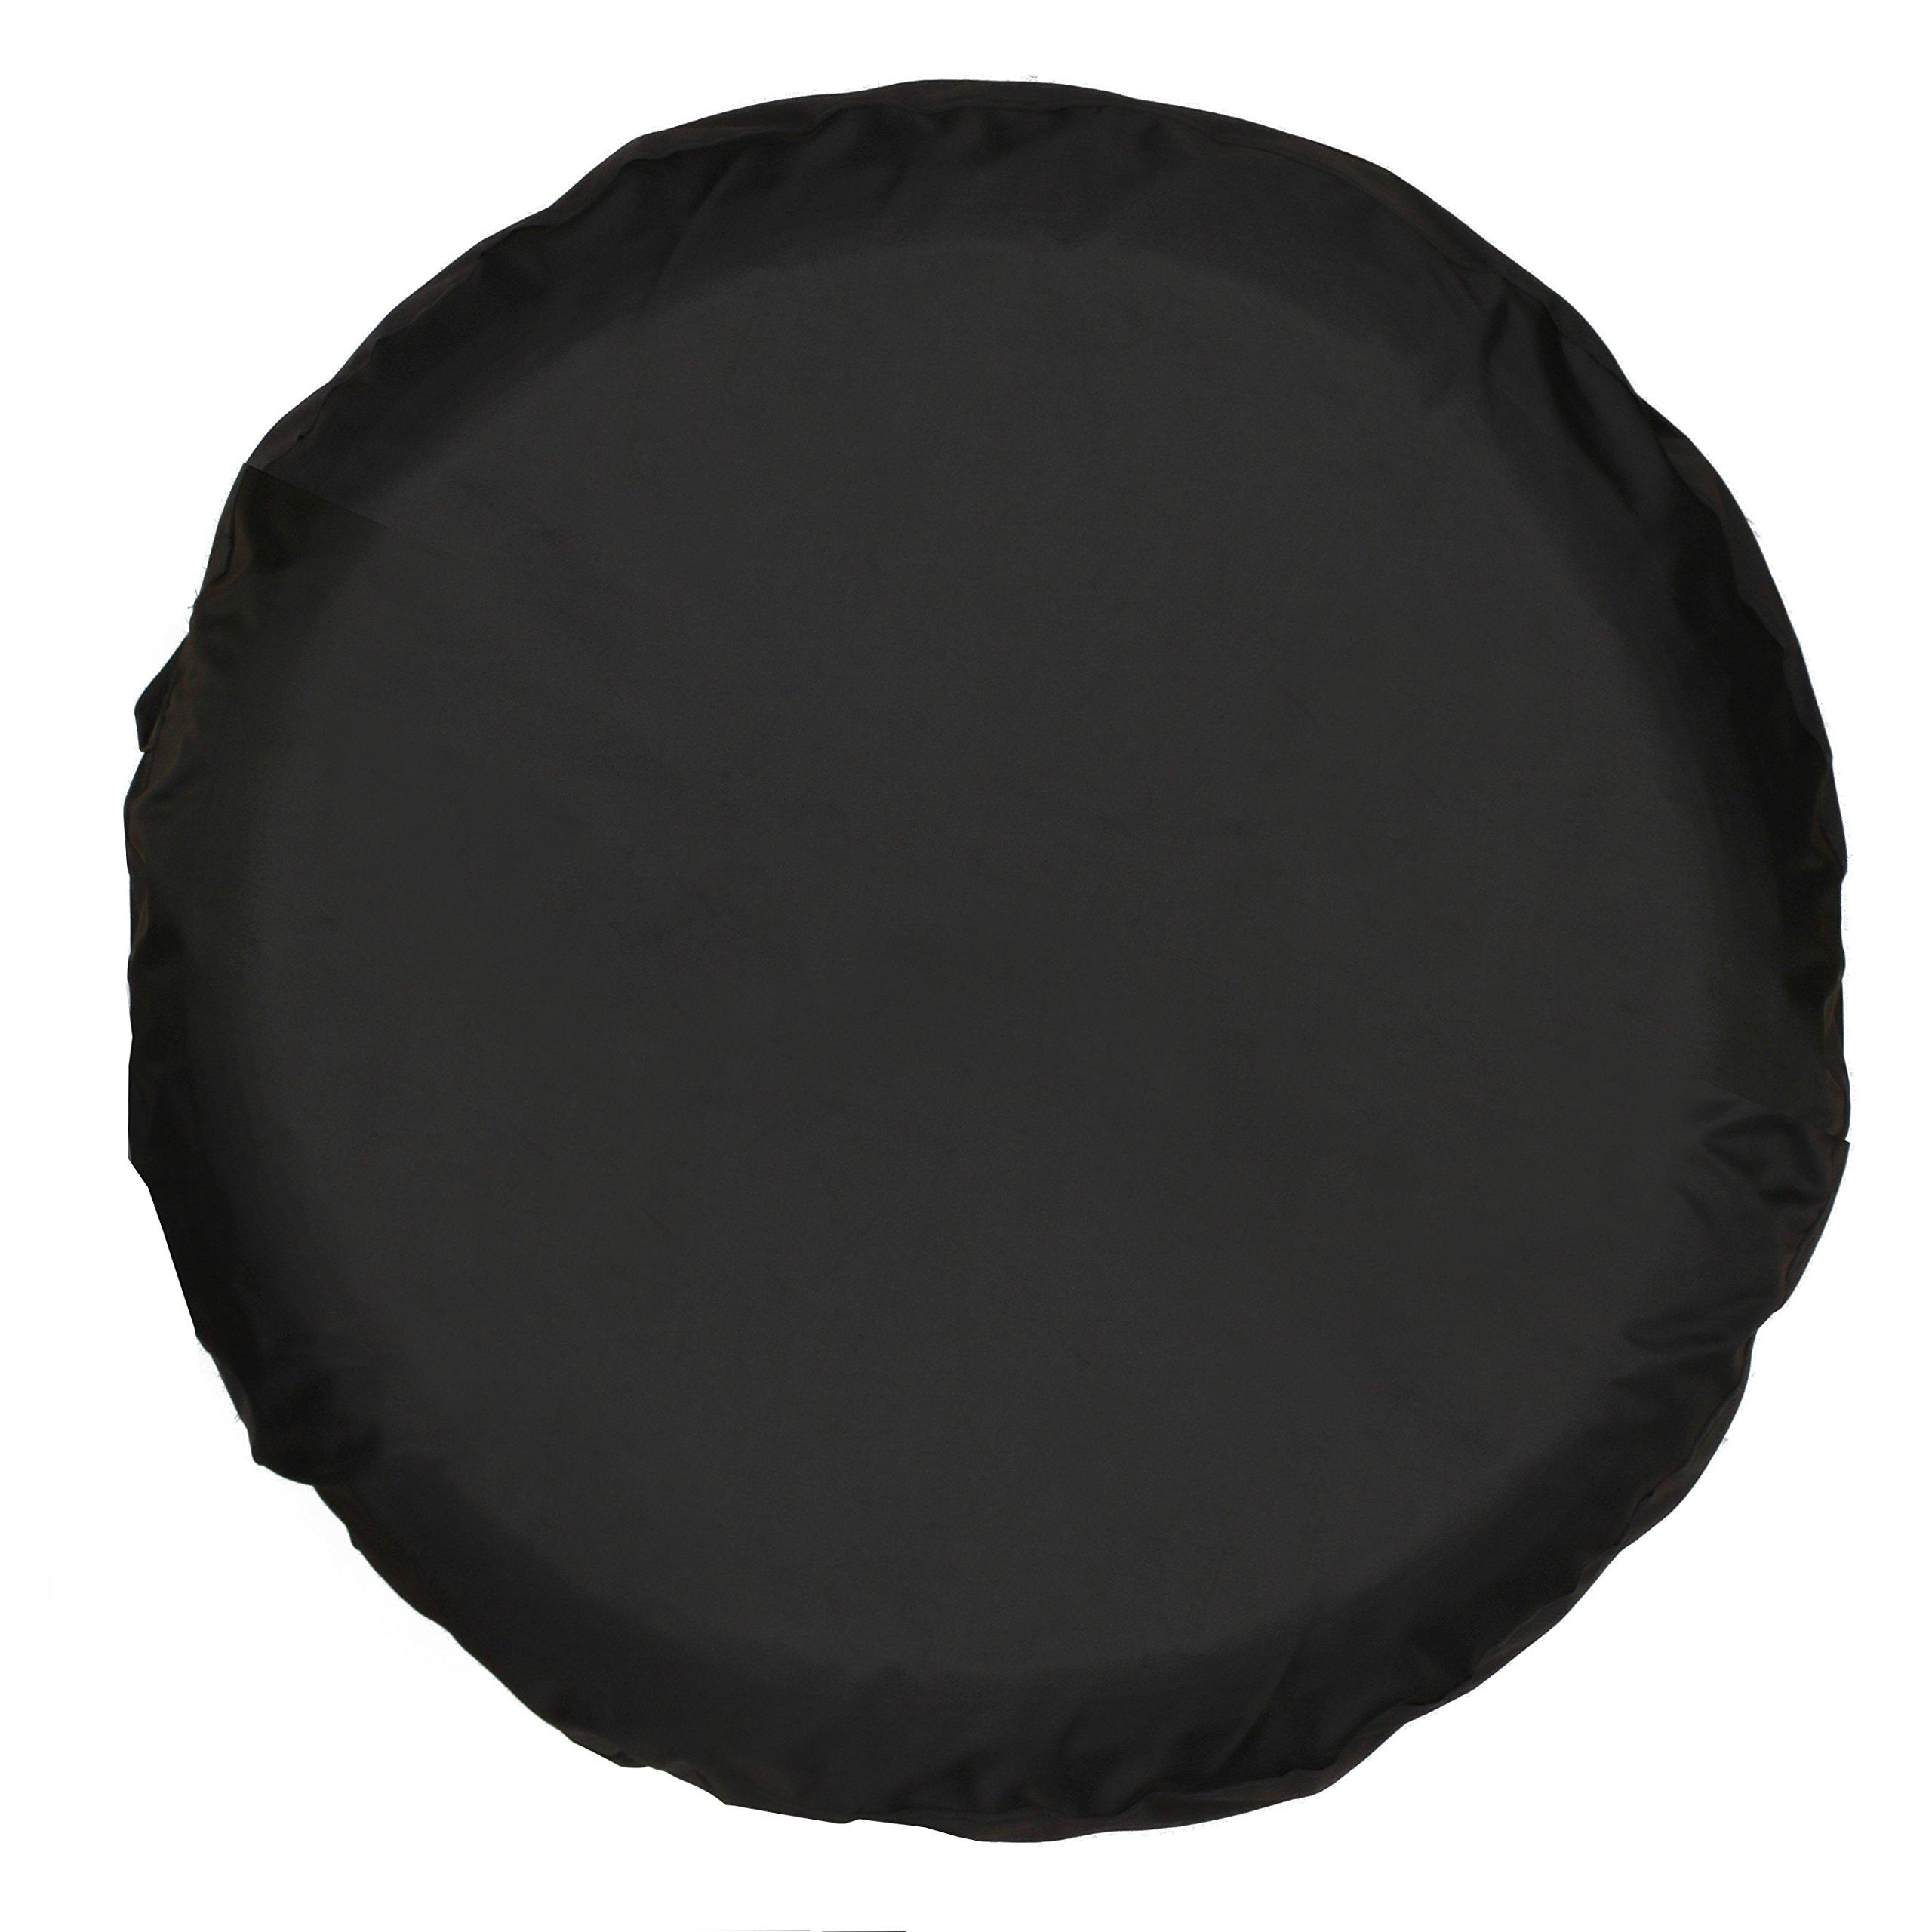 Universal Spare Tire Cover Black (18 inch)